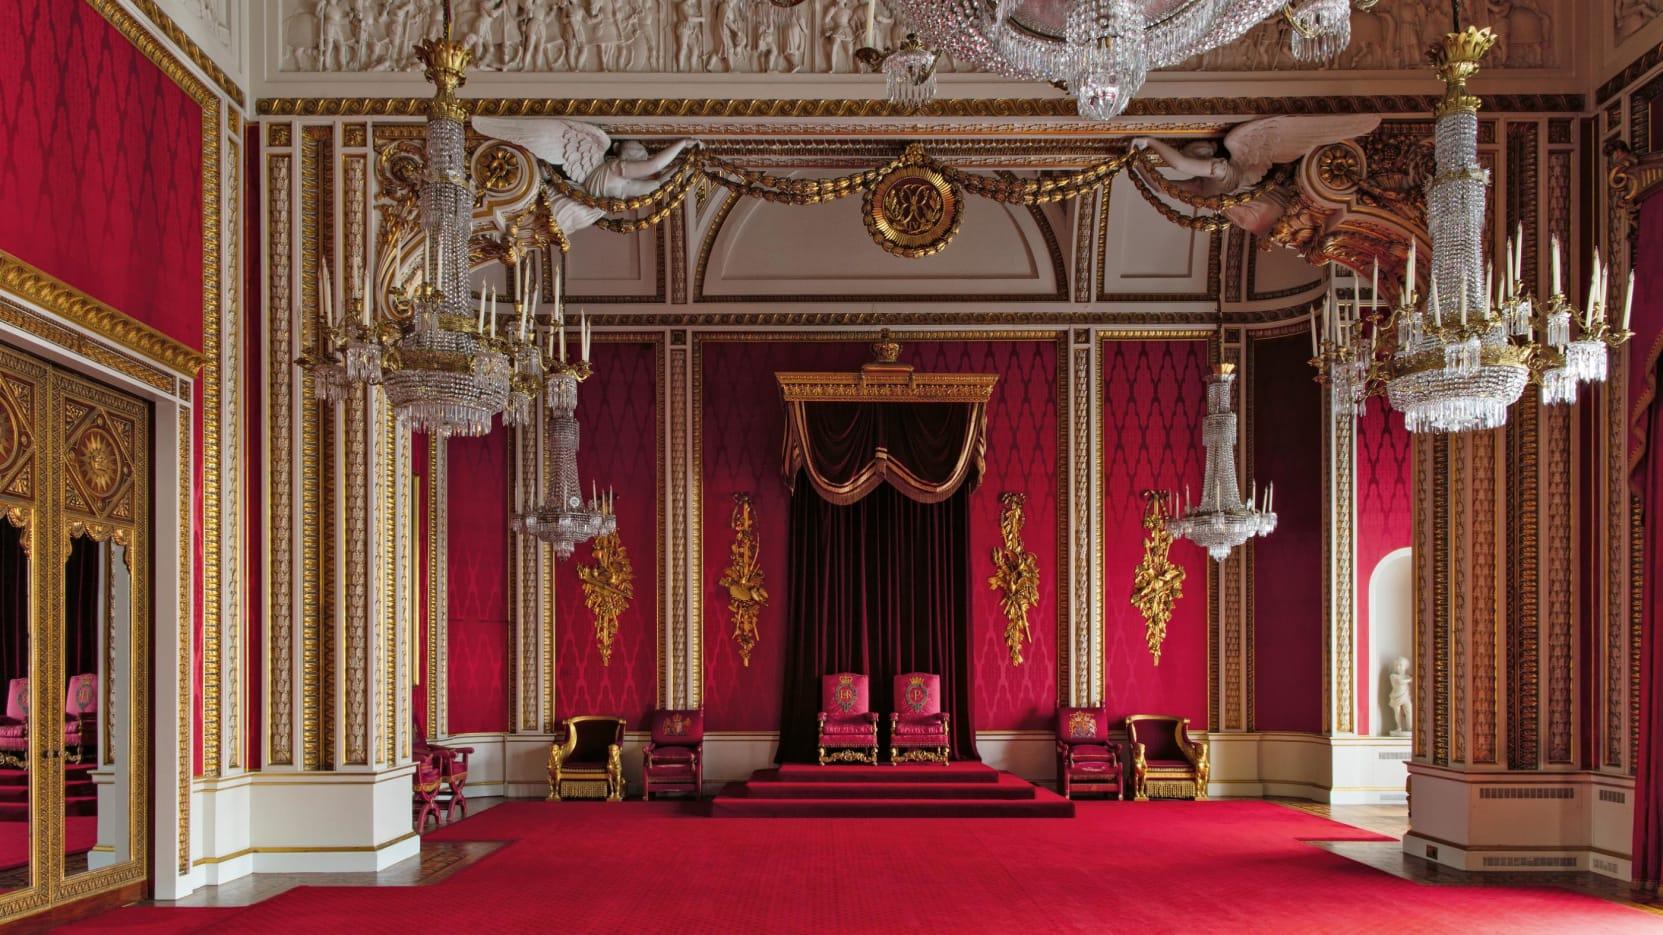 inside buckingham palace documentary - 1024×736